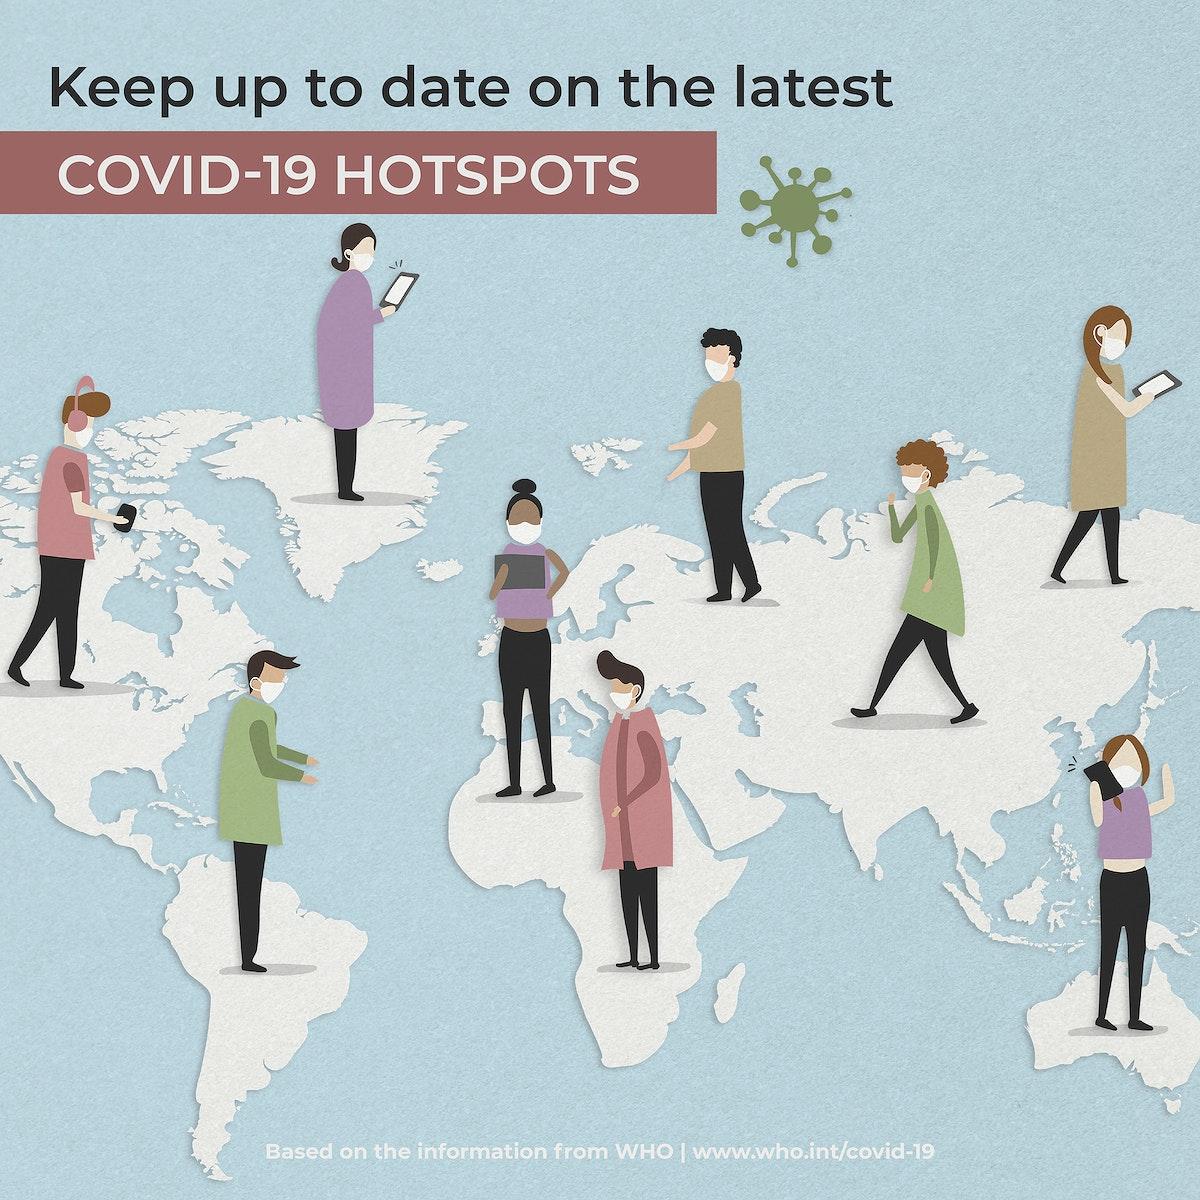 Latest update on COVID-19 hotspot illustration vector social ad